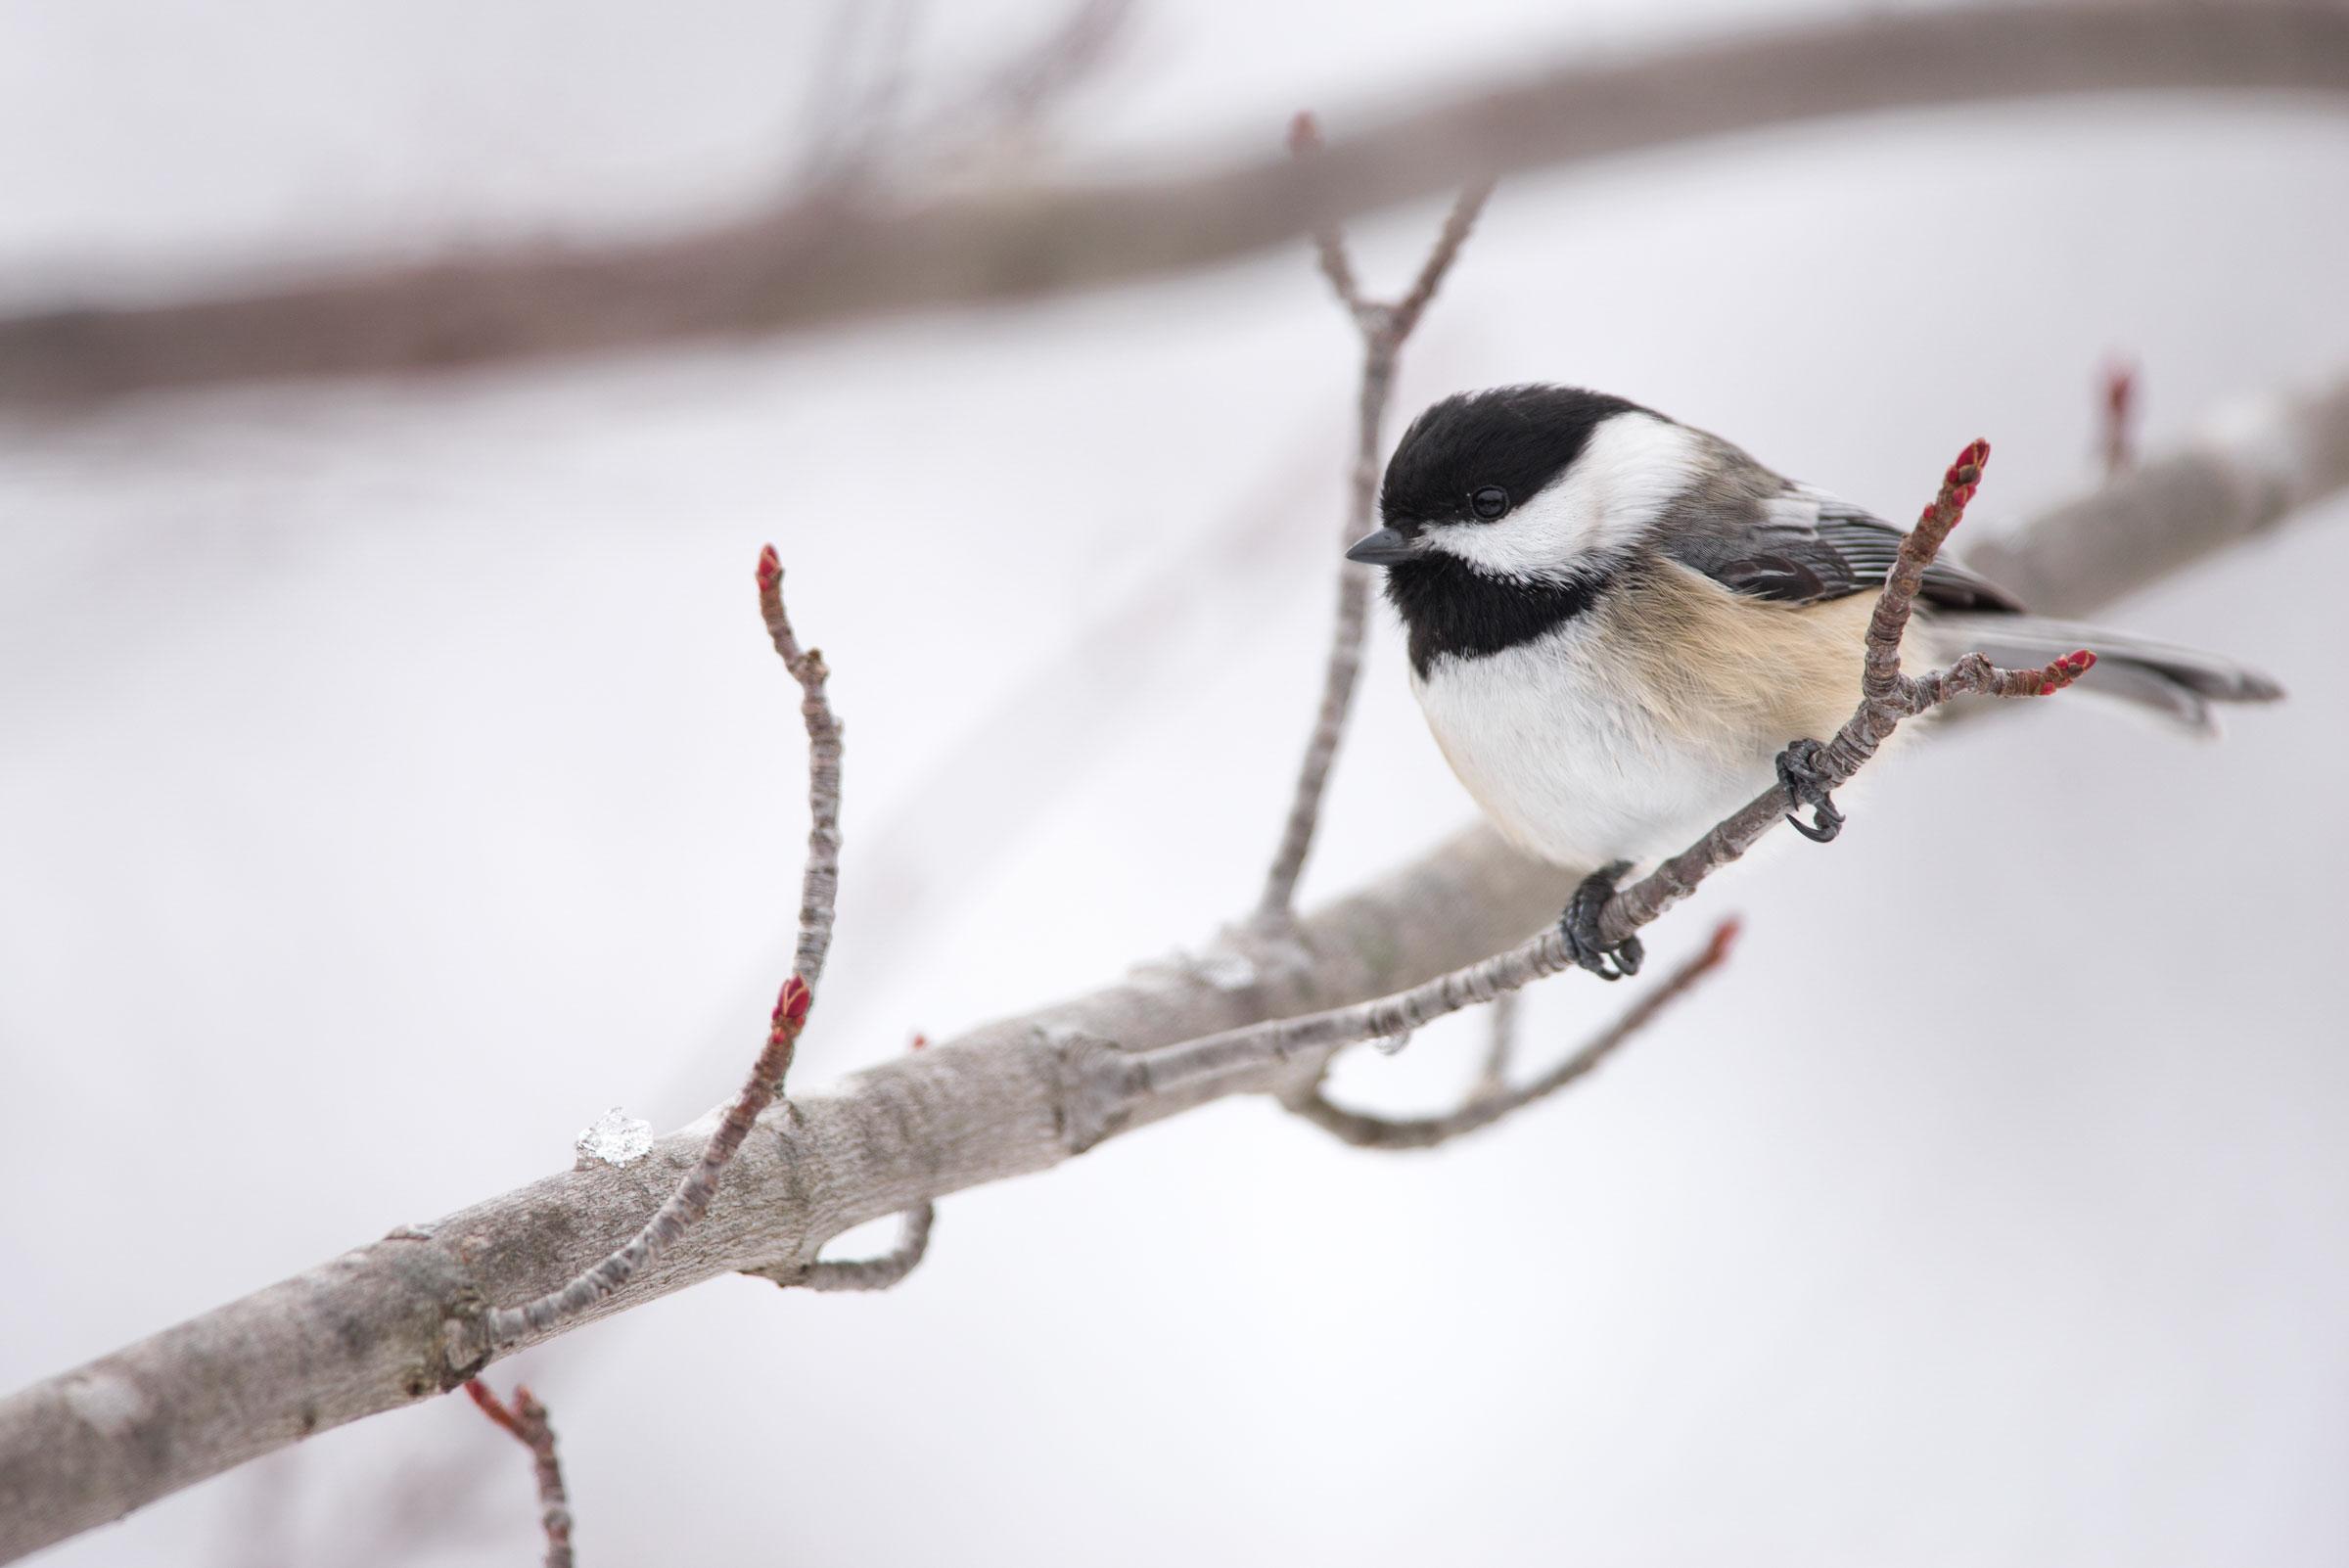 Black-capped Chickadee. Jeff O'Keeffe/Audubon Photography Awards